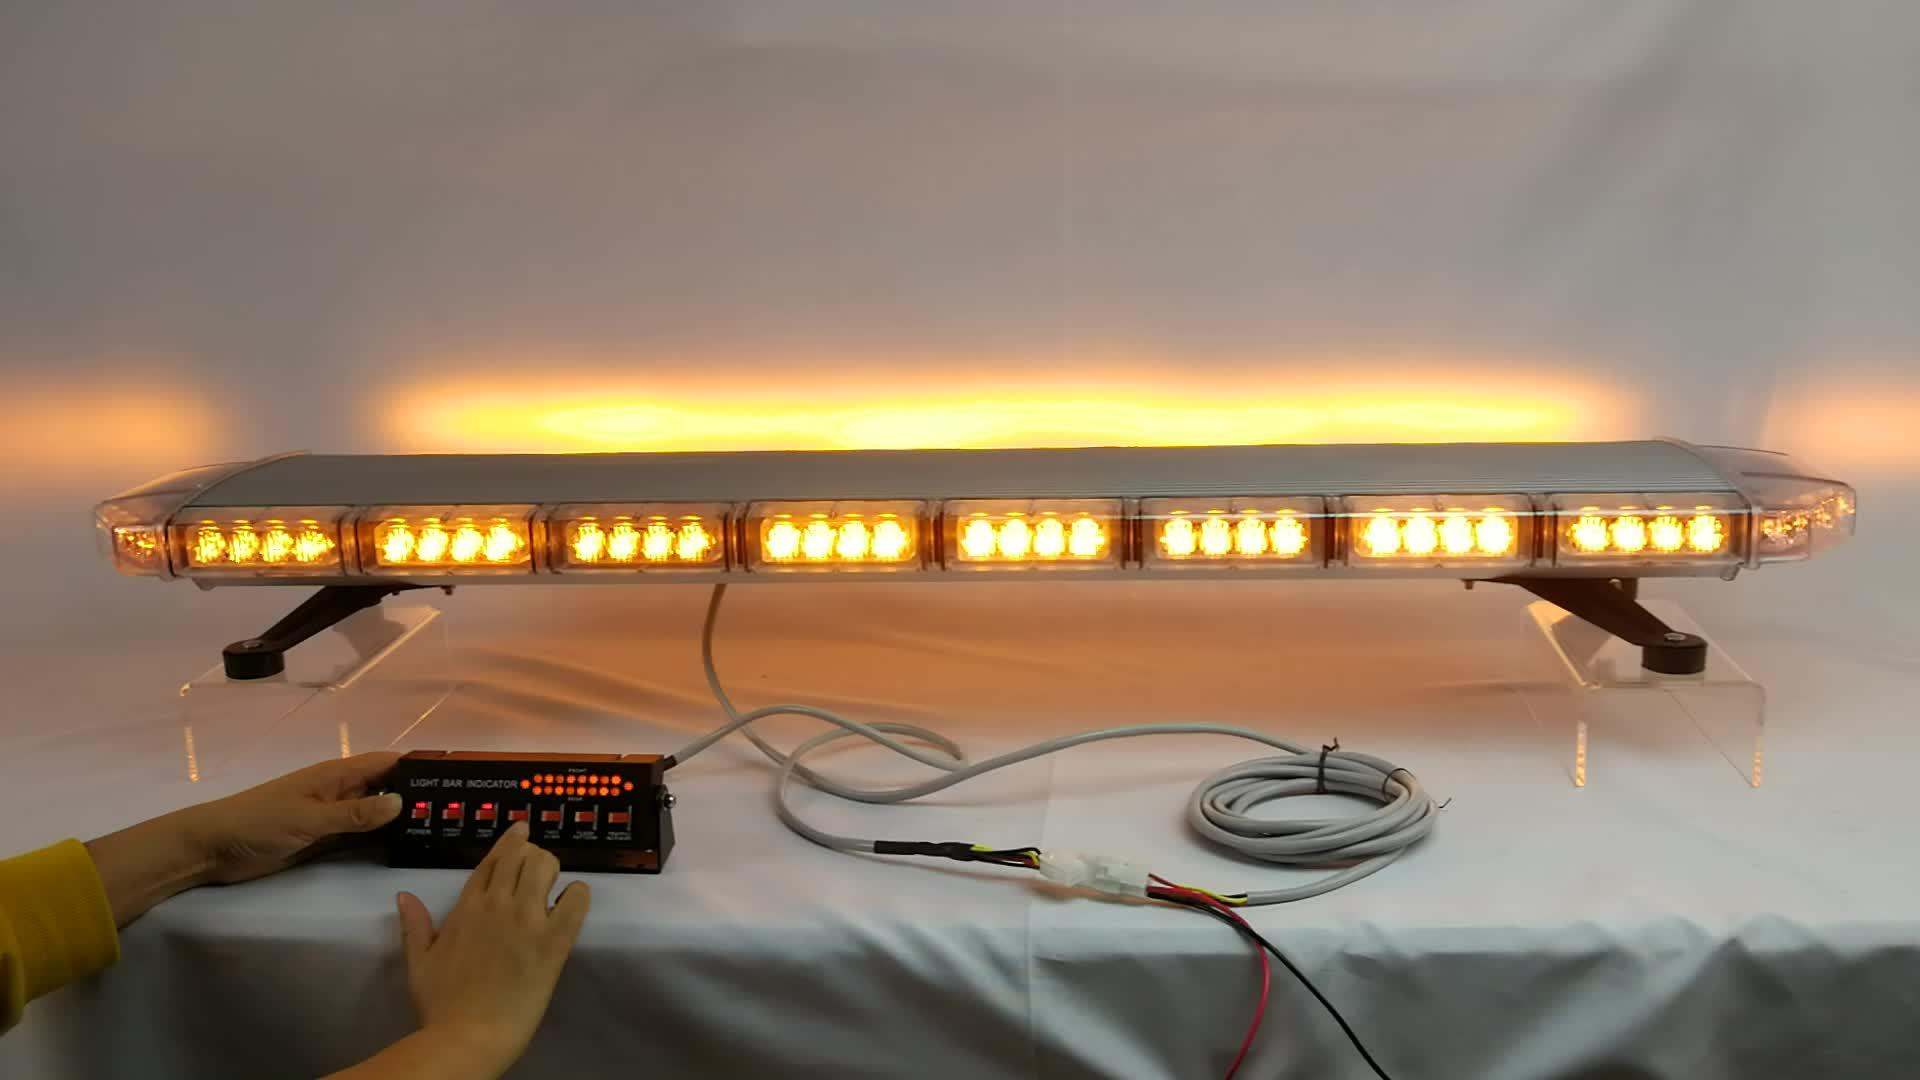 Security Vehicle Amber Strobe Lightbar Led emergency light bar use in Armored Cars (TBD20926)